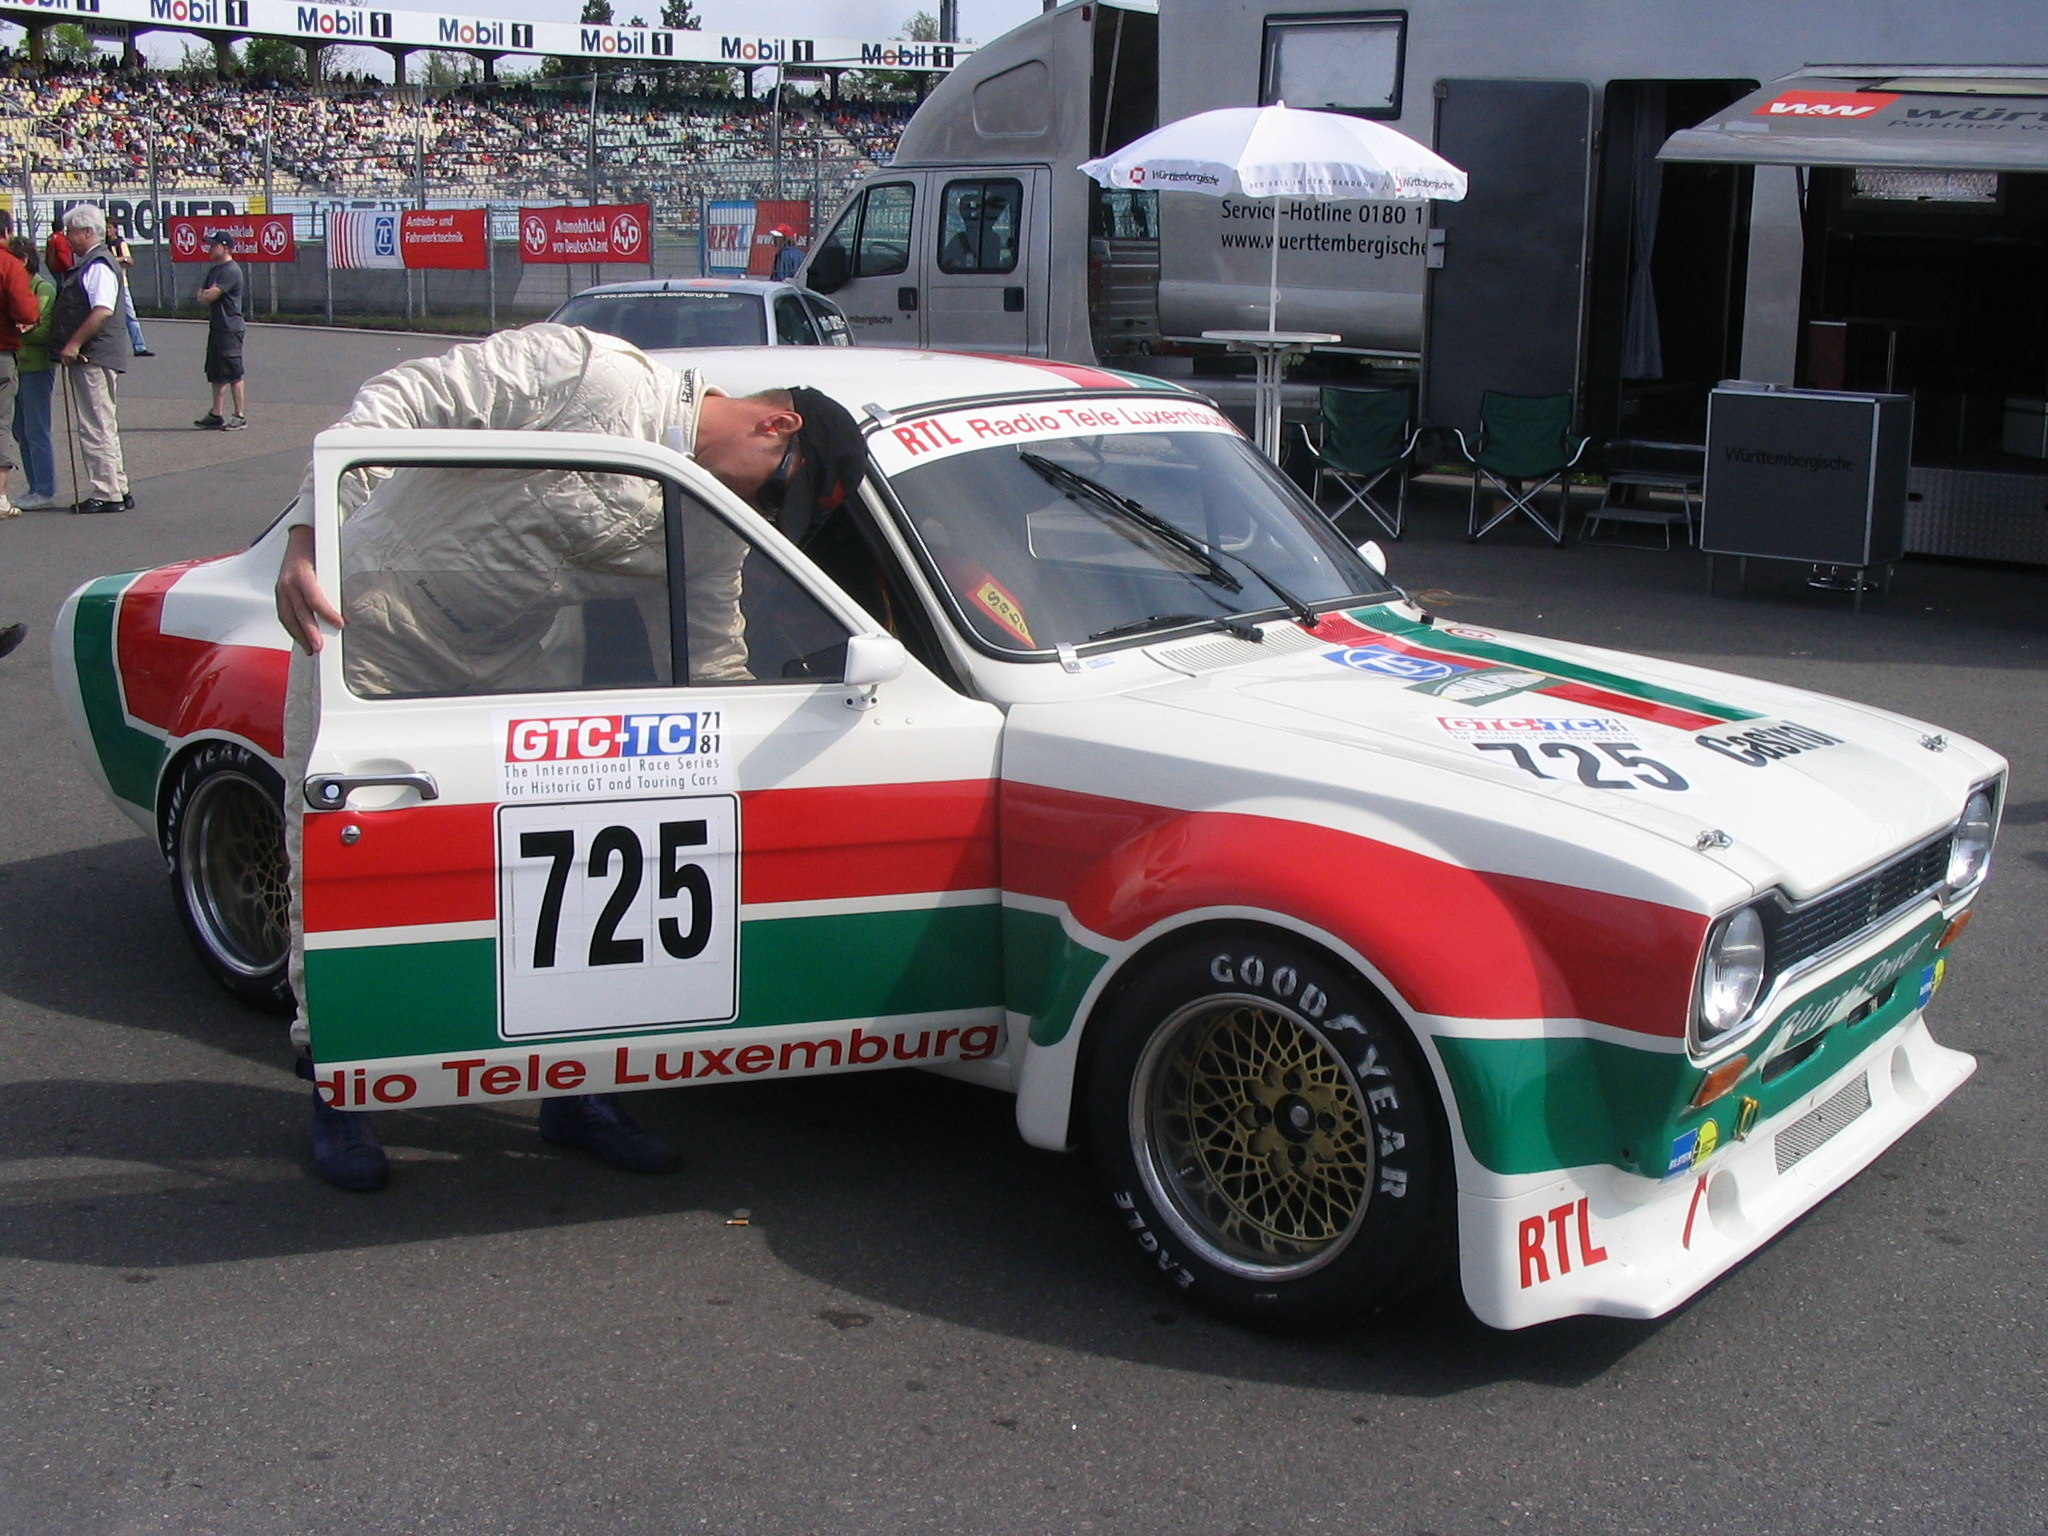 http://upload.wikimedia.org/wikipedia/commons/c/cb/Ford_Escort_RS_1600.jpg